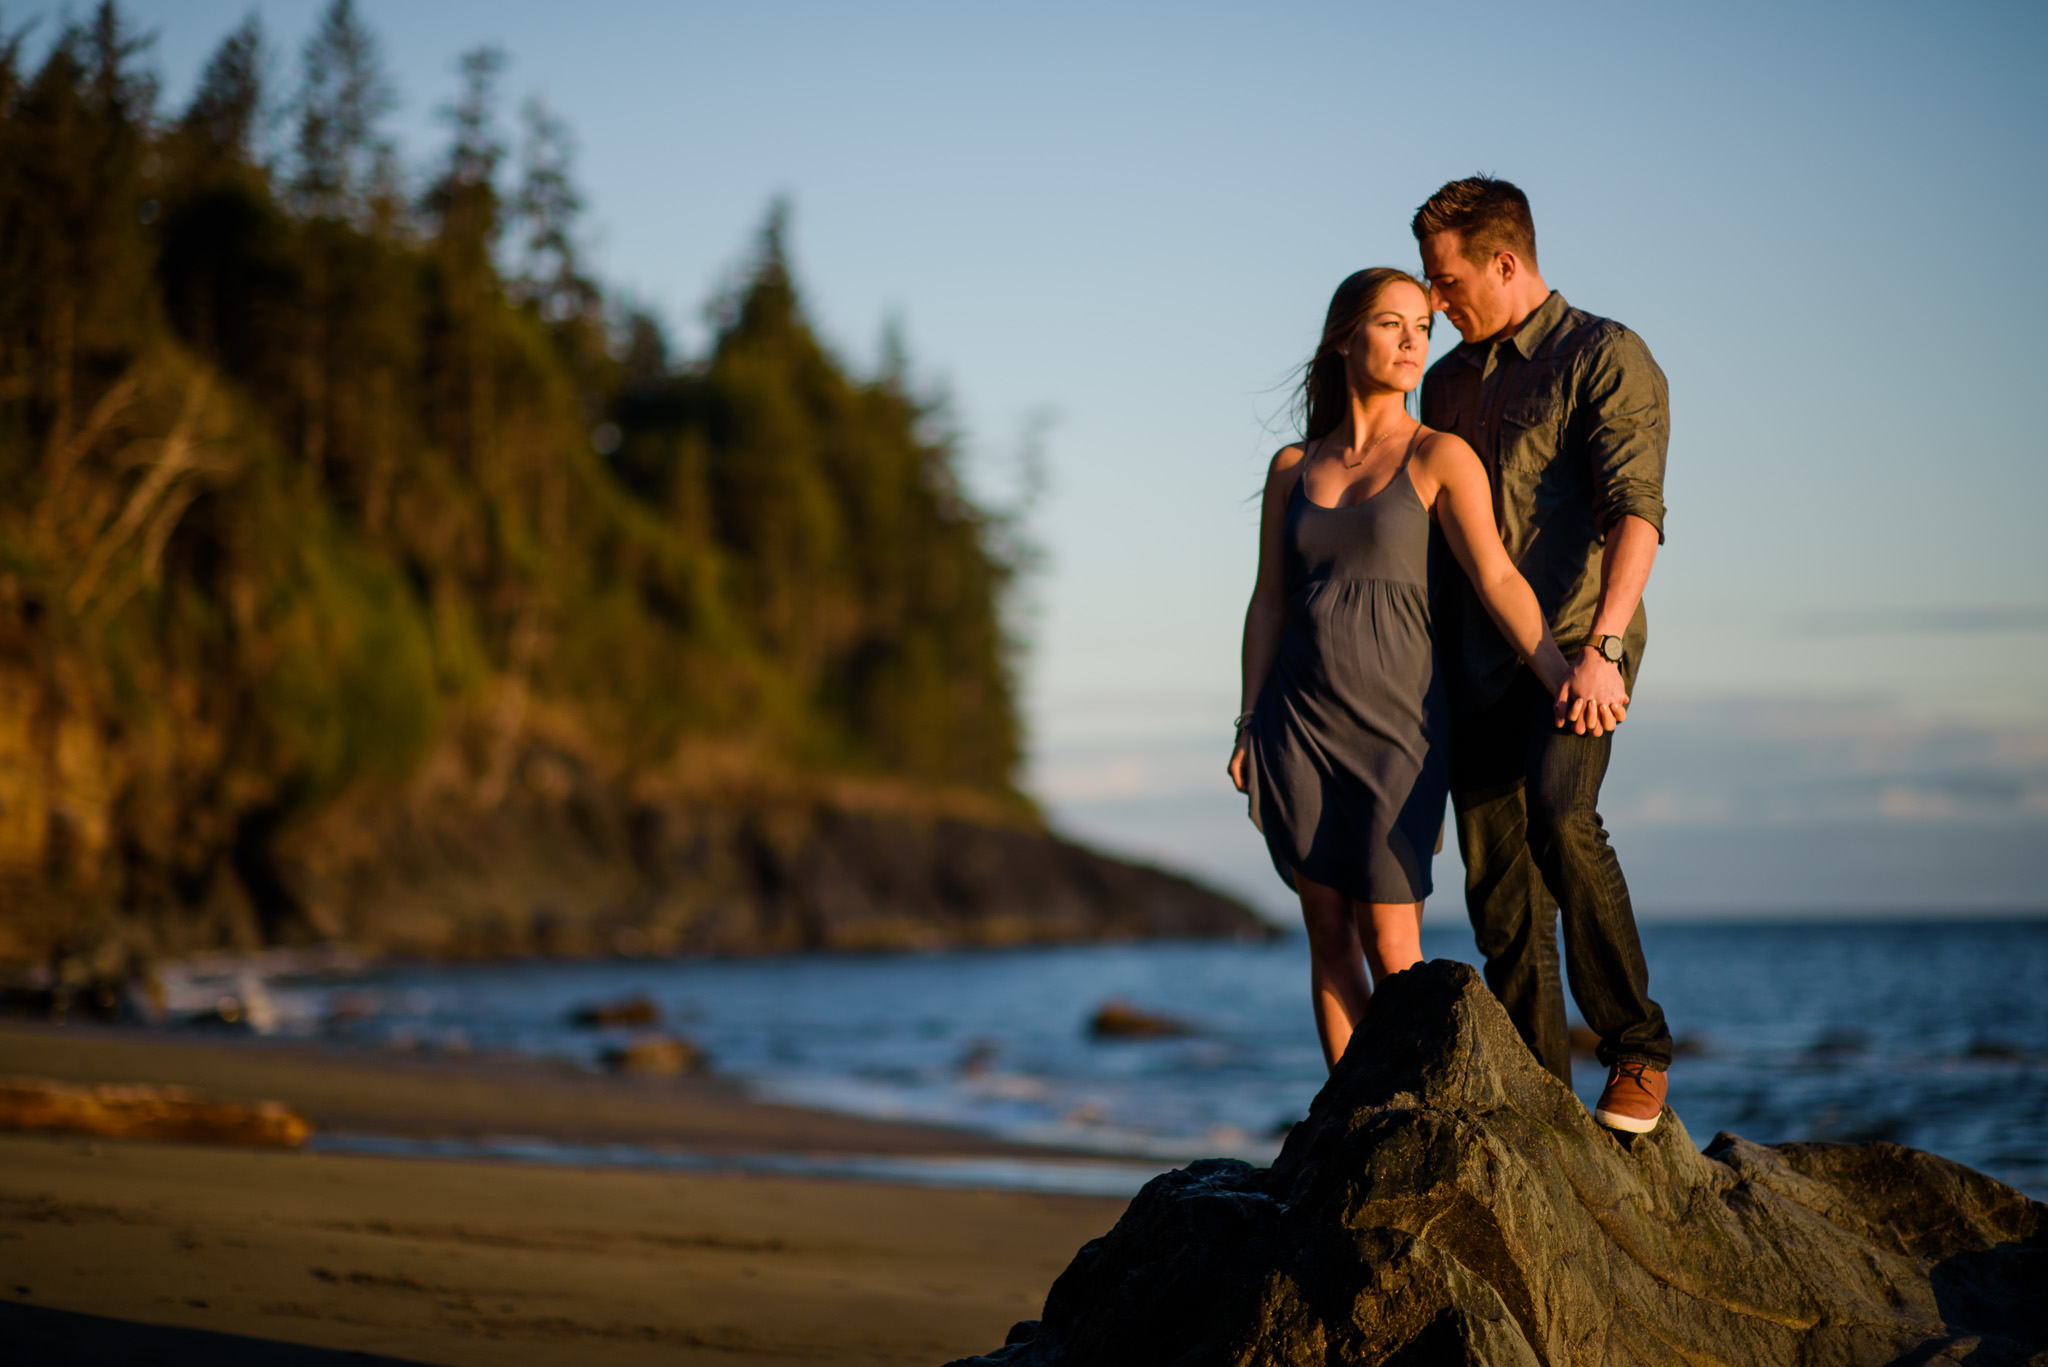 mystic-beach-engagement-victoria-wedding-photographer-28.jpg